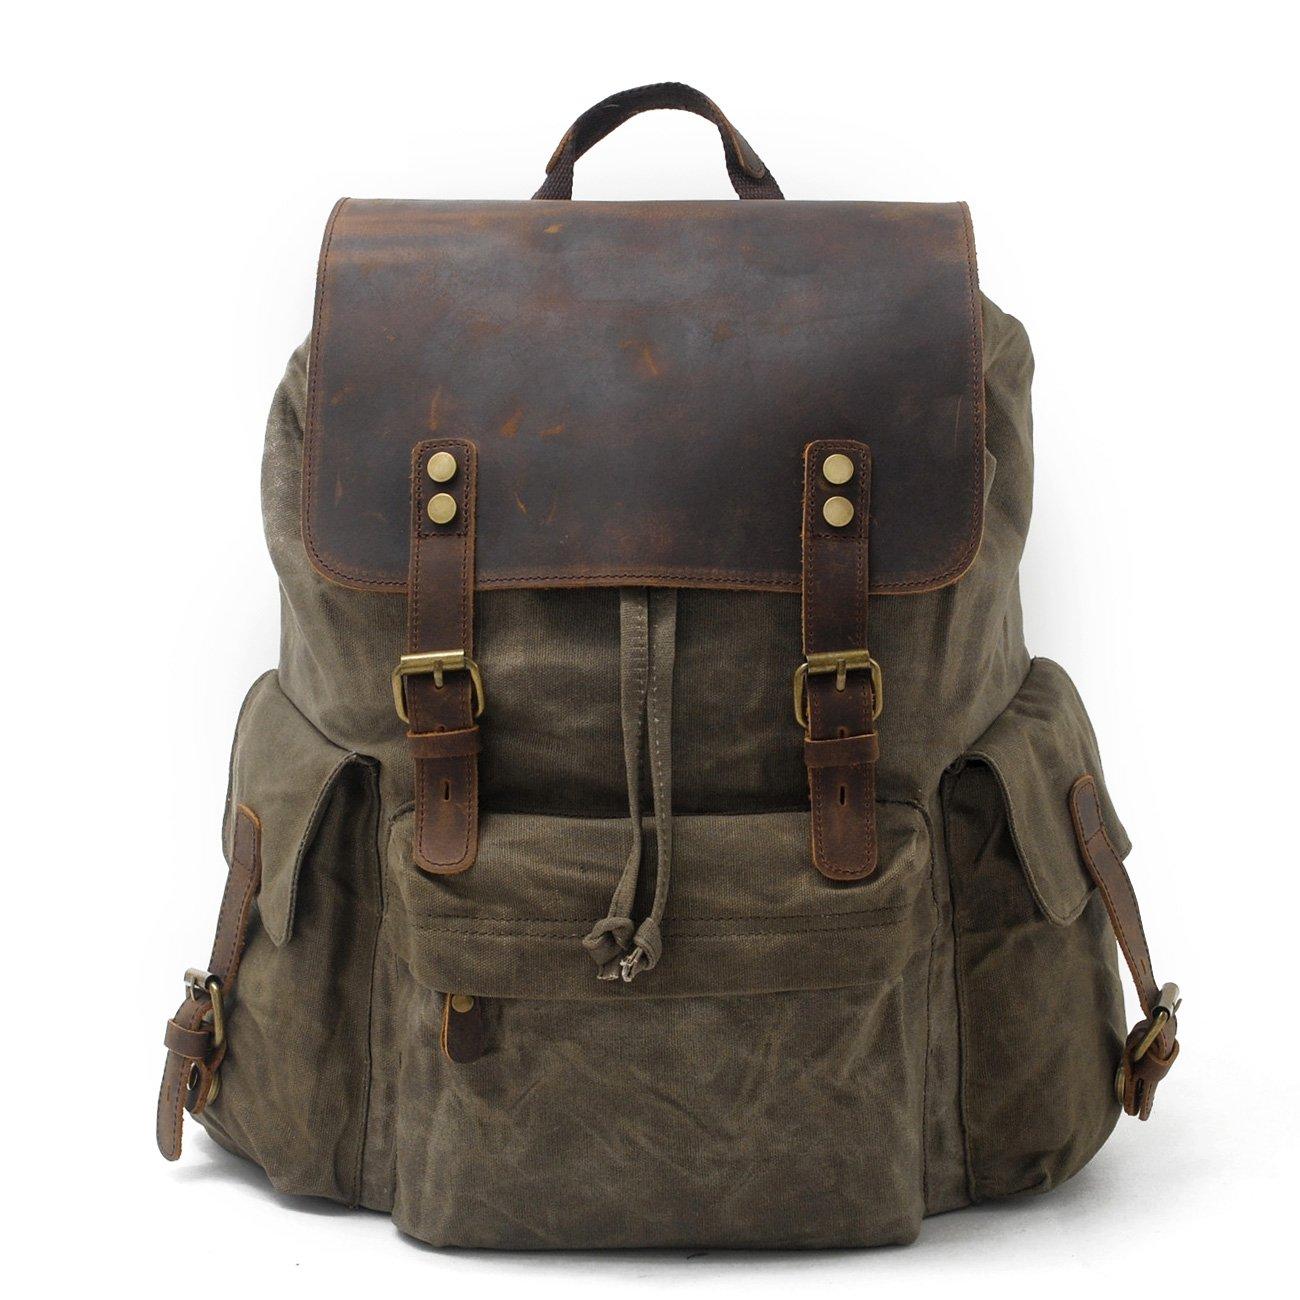 SUVOM Vintage Canvas Genuine Leather Laptop Backpack for Men School Bag 15.6'' Waterproof Travel Rucksack (Green) by SUVOM